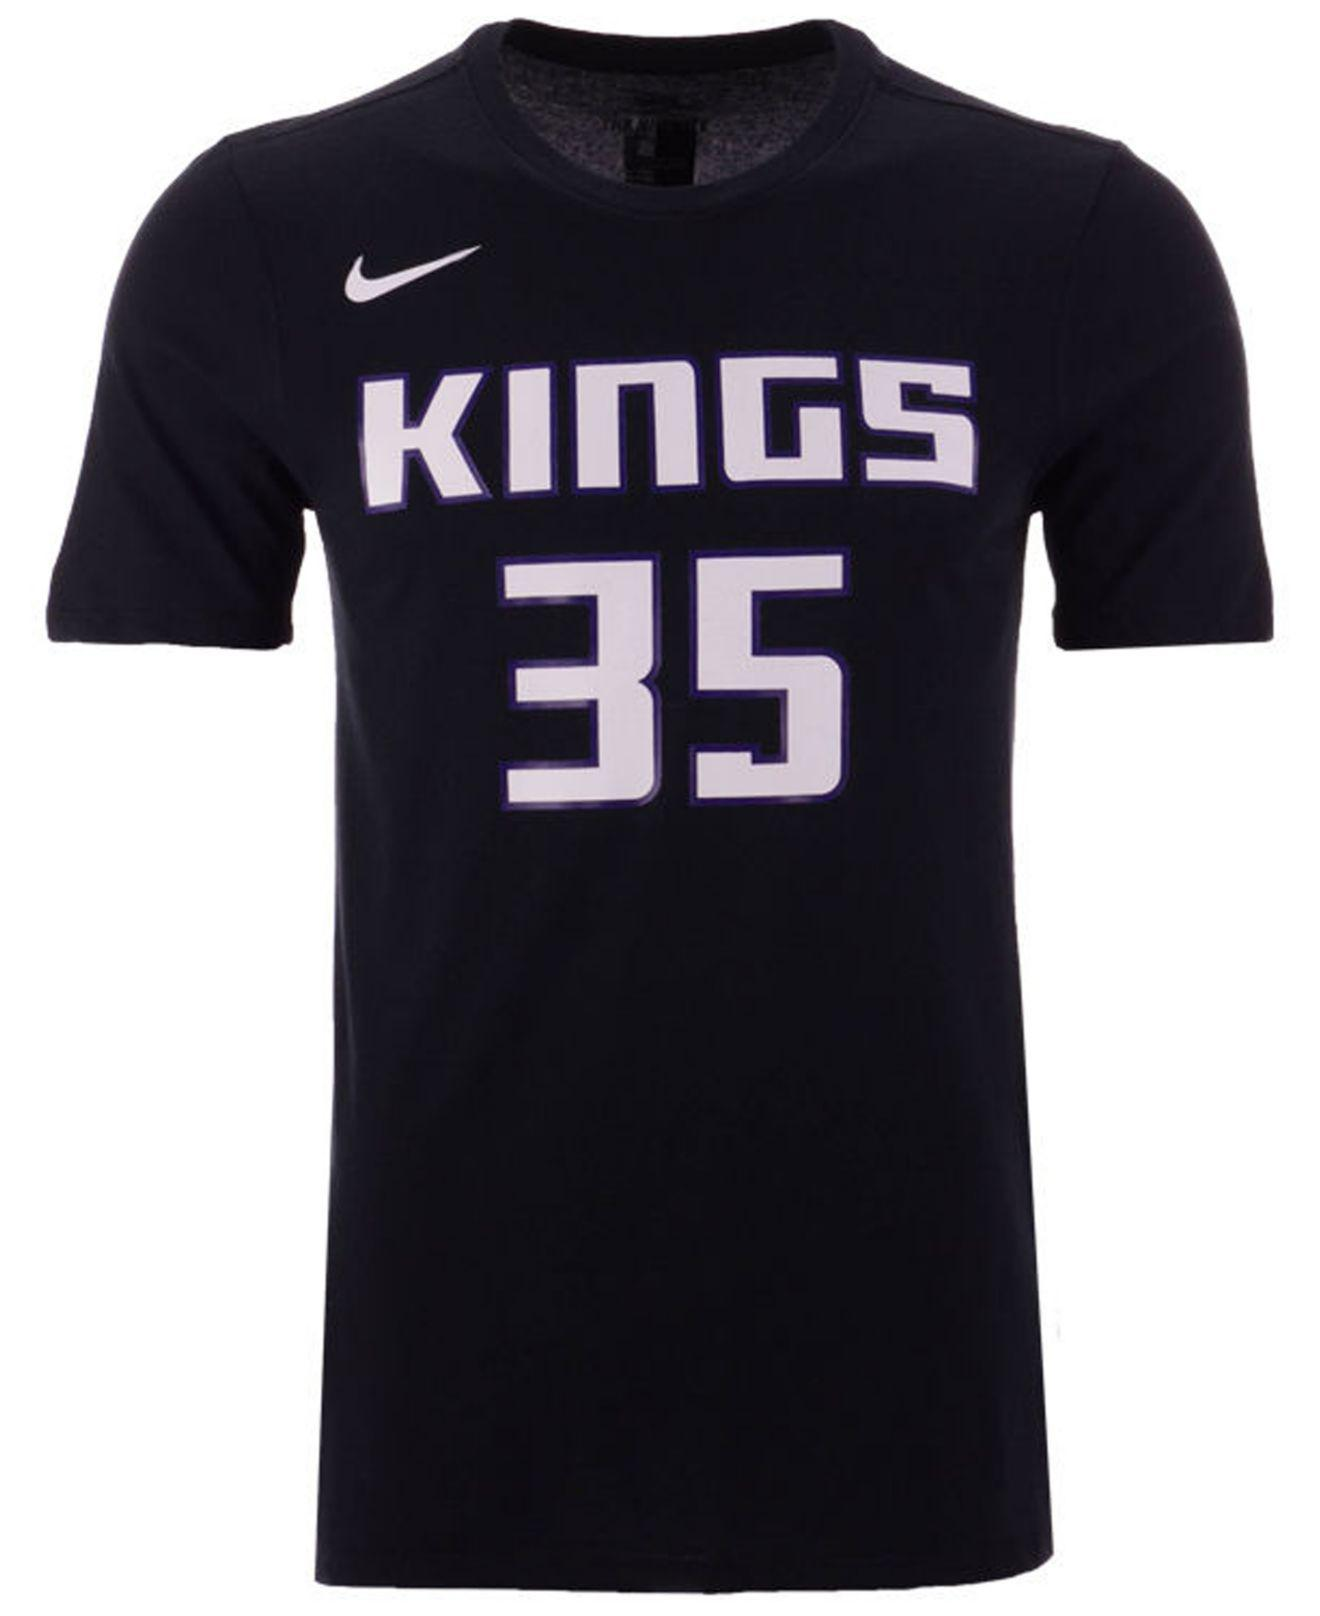 9da5b4f0751b Lyst - Nike Marvin Bagley Iii Sacramento Kings Statement Player T-shirt in  Black for Men